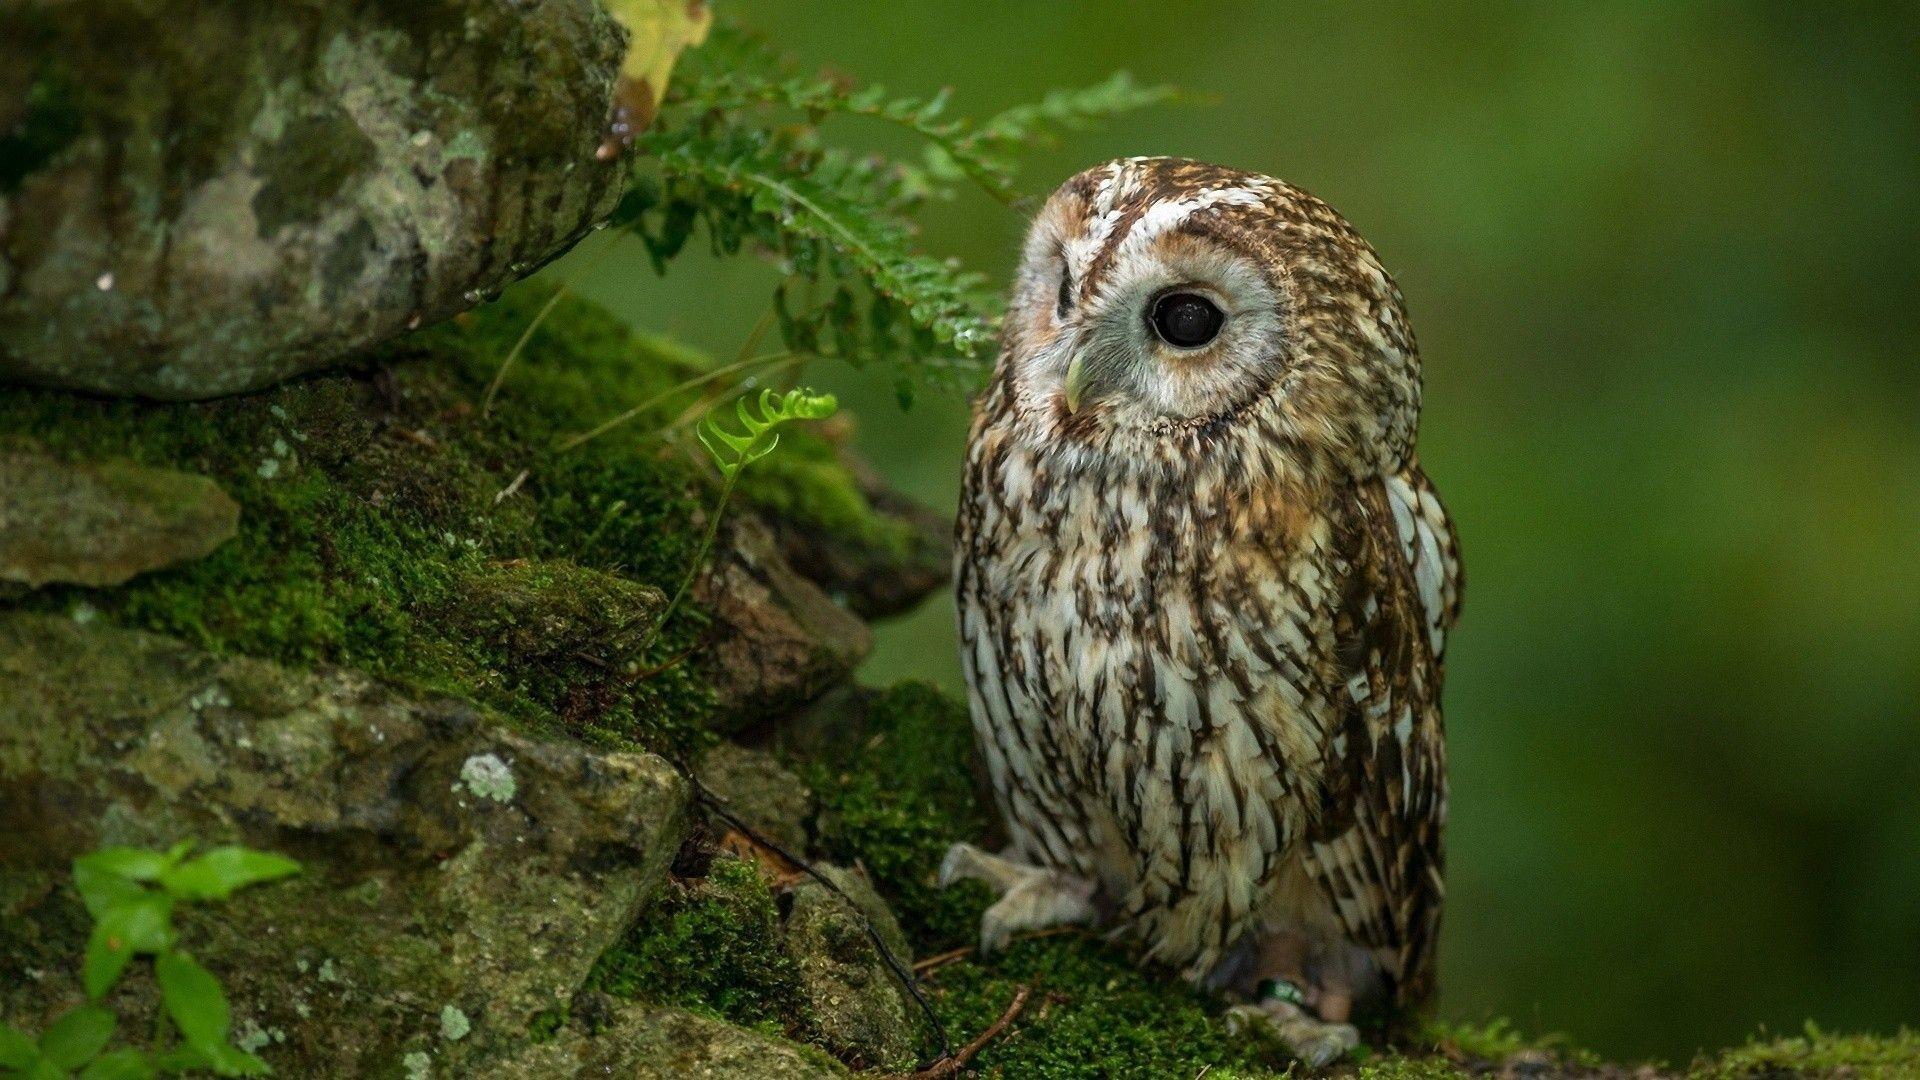 Res: 1920x1080, cute-baby-owl-wallpaper-bd-cute-baby-owl-